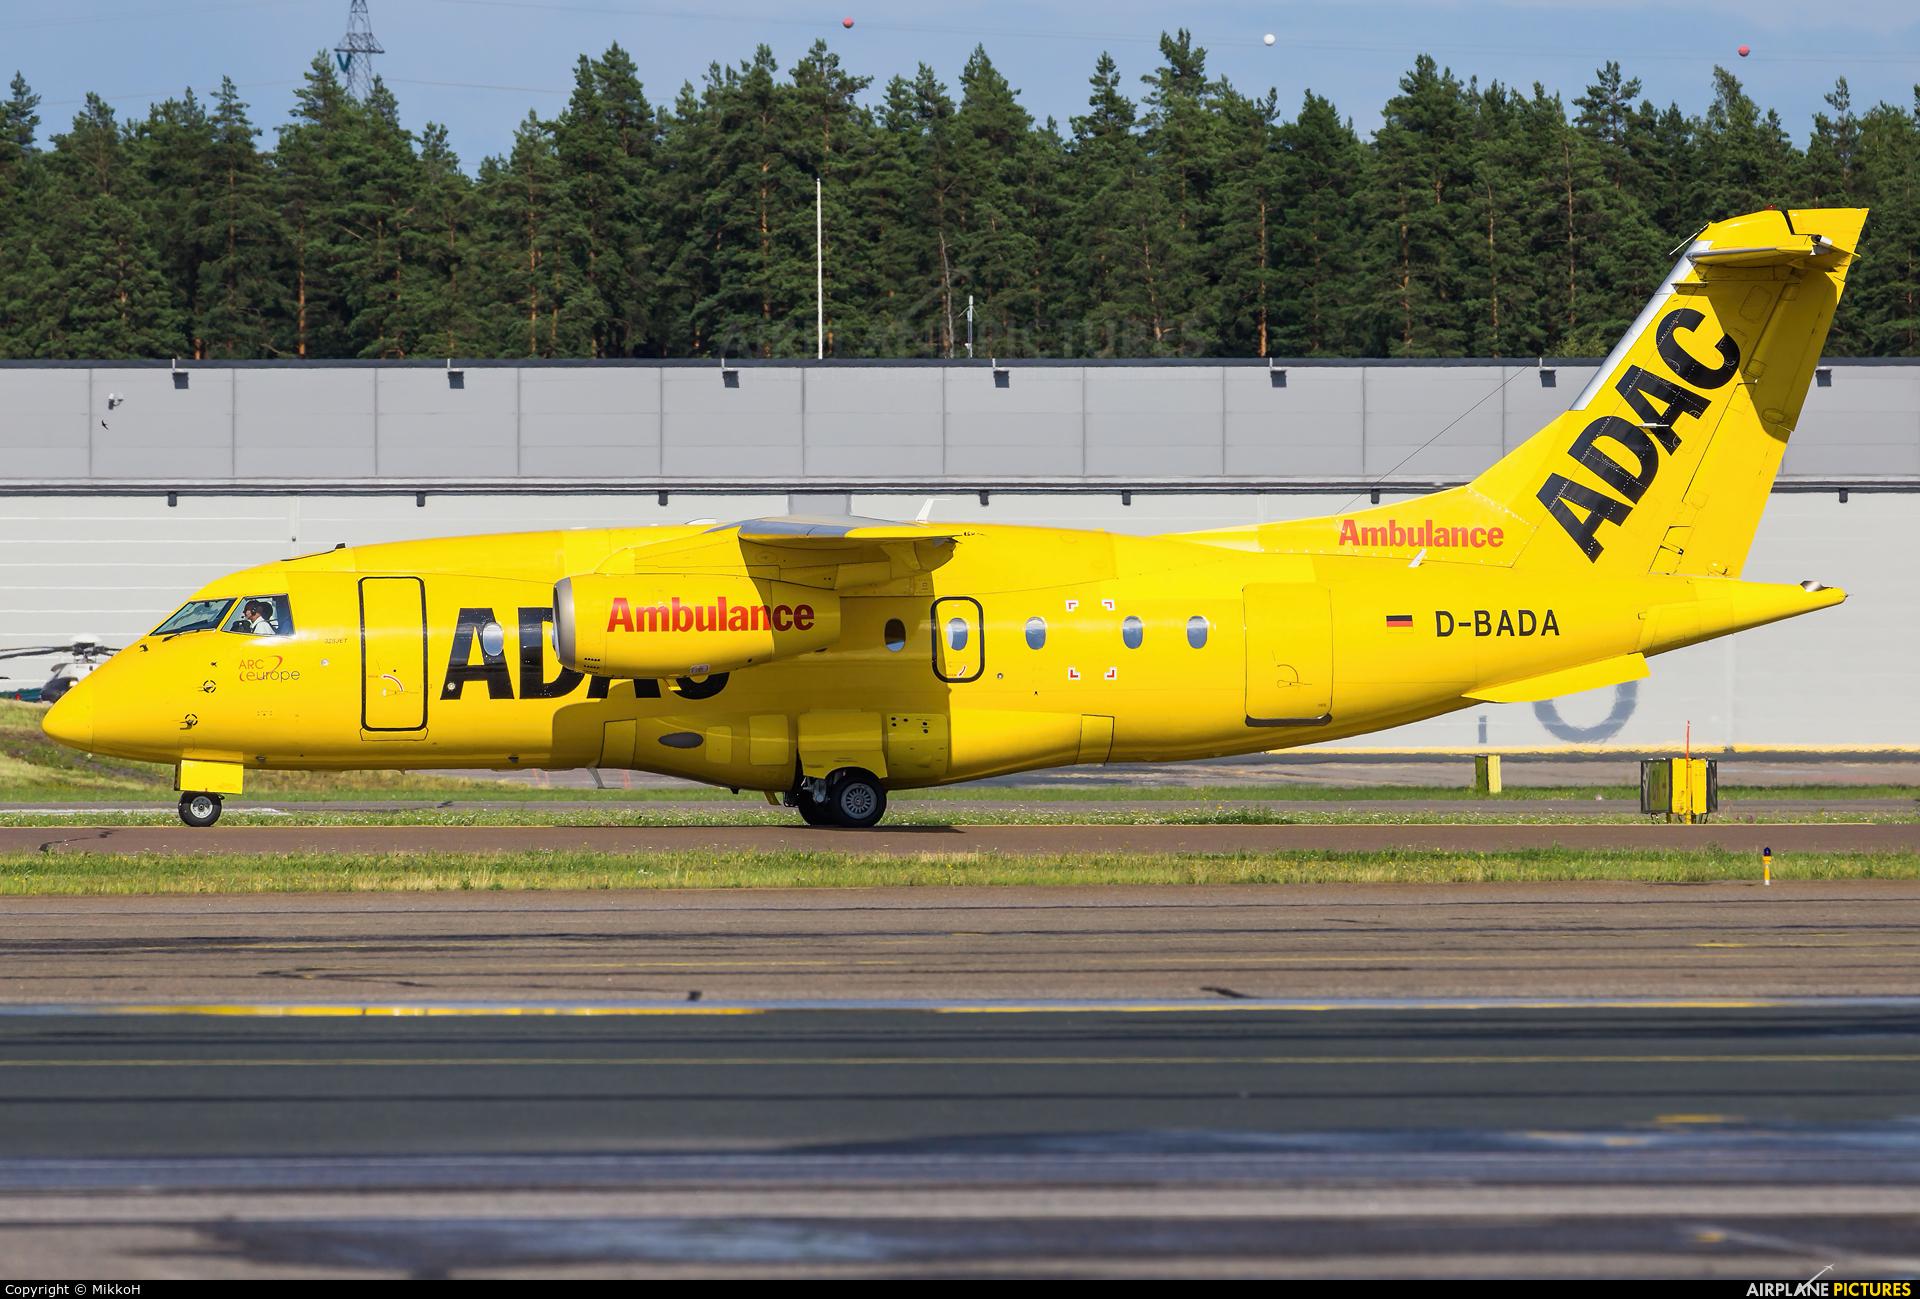 ADAC Luftrettung D-BADA aircraft at Helsinki - Vantaa